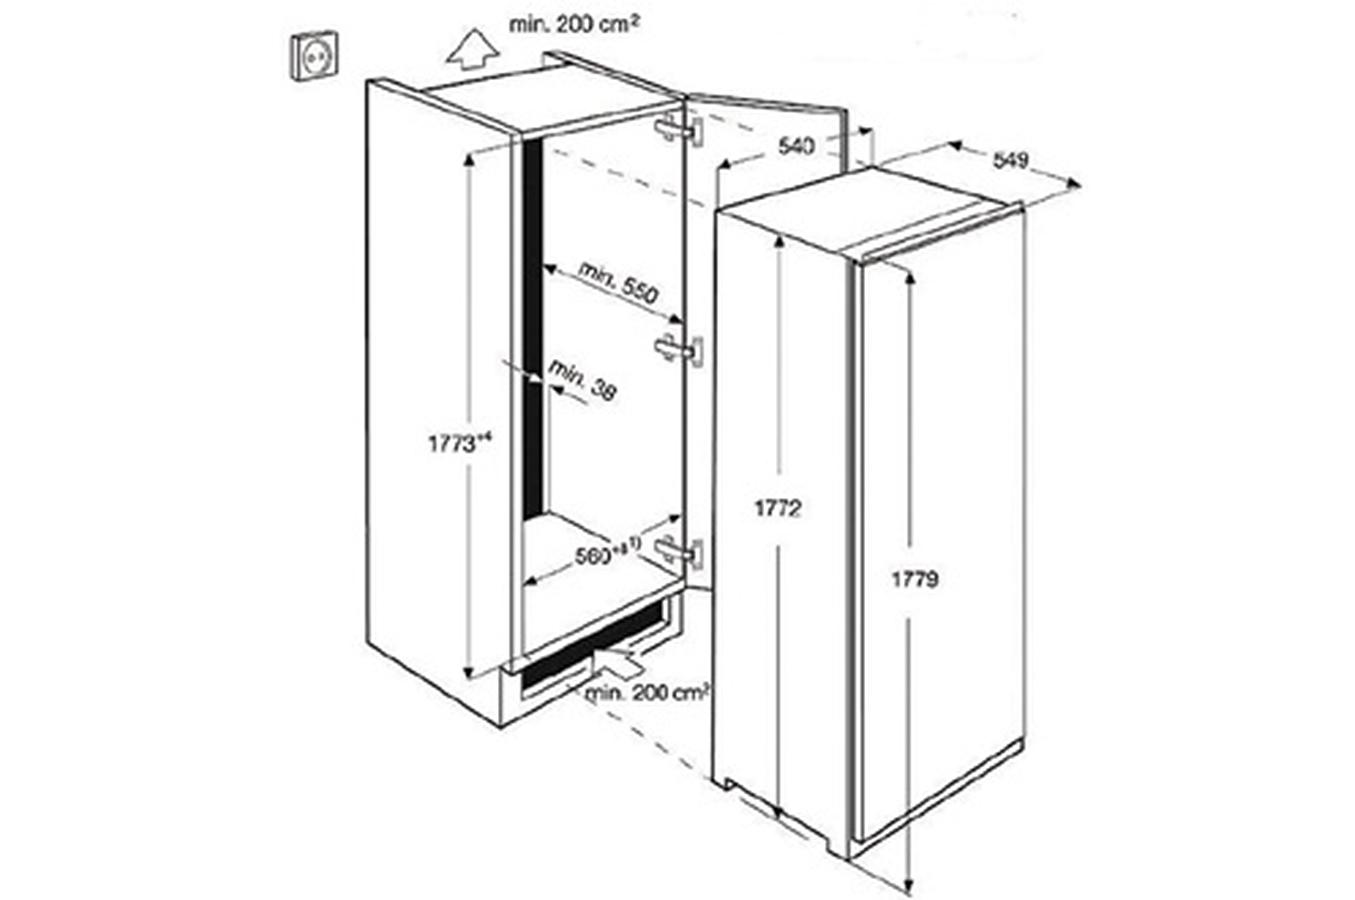 Meuble cuisine pour salle de bain for Utiliser meuble cuisine pour salle de bain